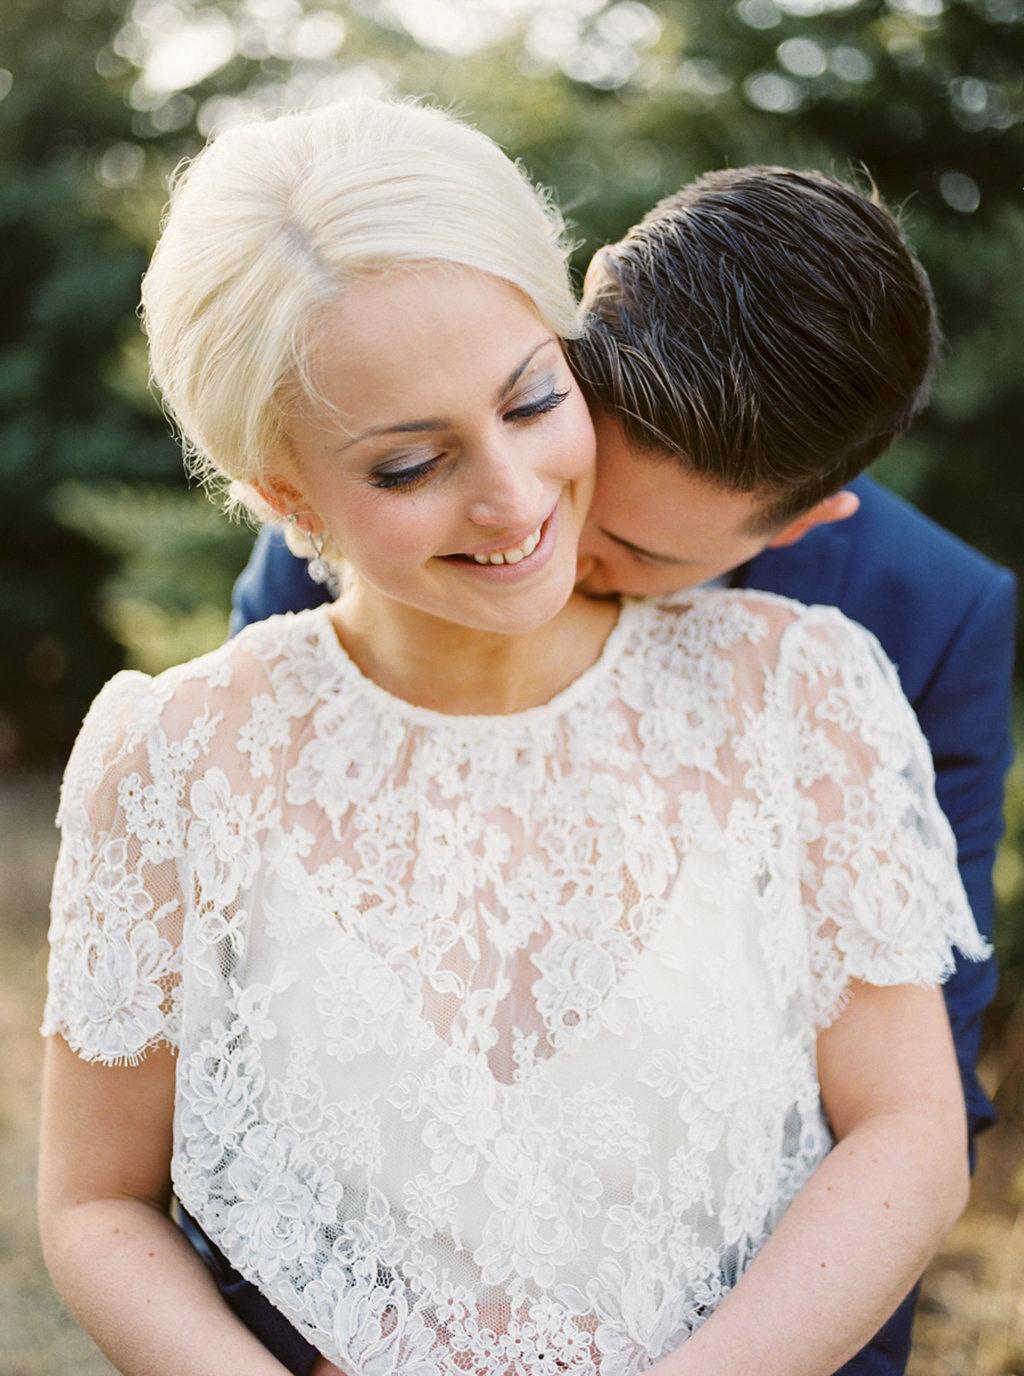 kayla-yestal-photography-vineyard-bride-swish-list-beamer-falls-manor-grimsby-engagement-8.jpg